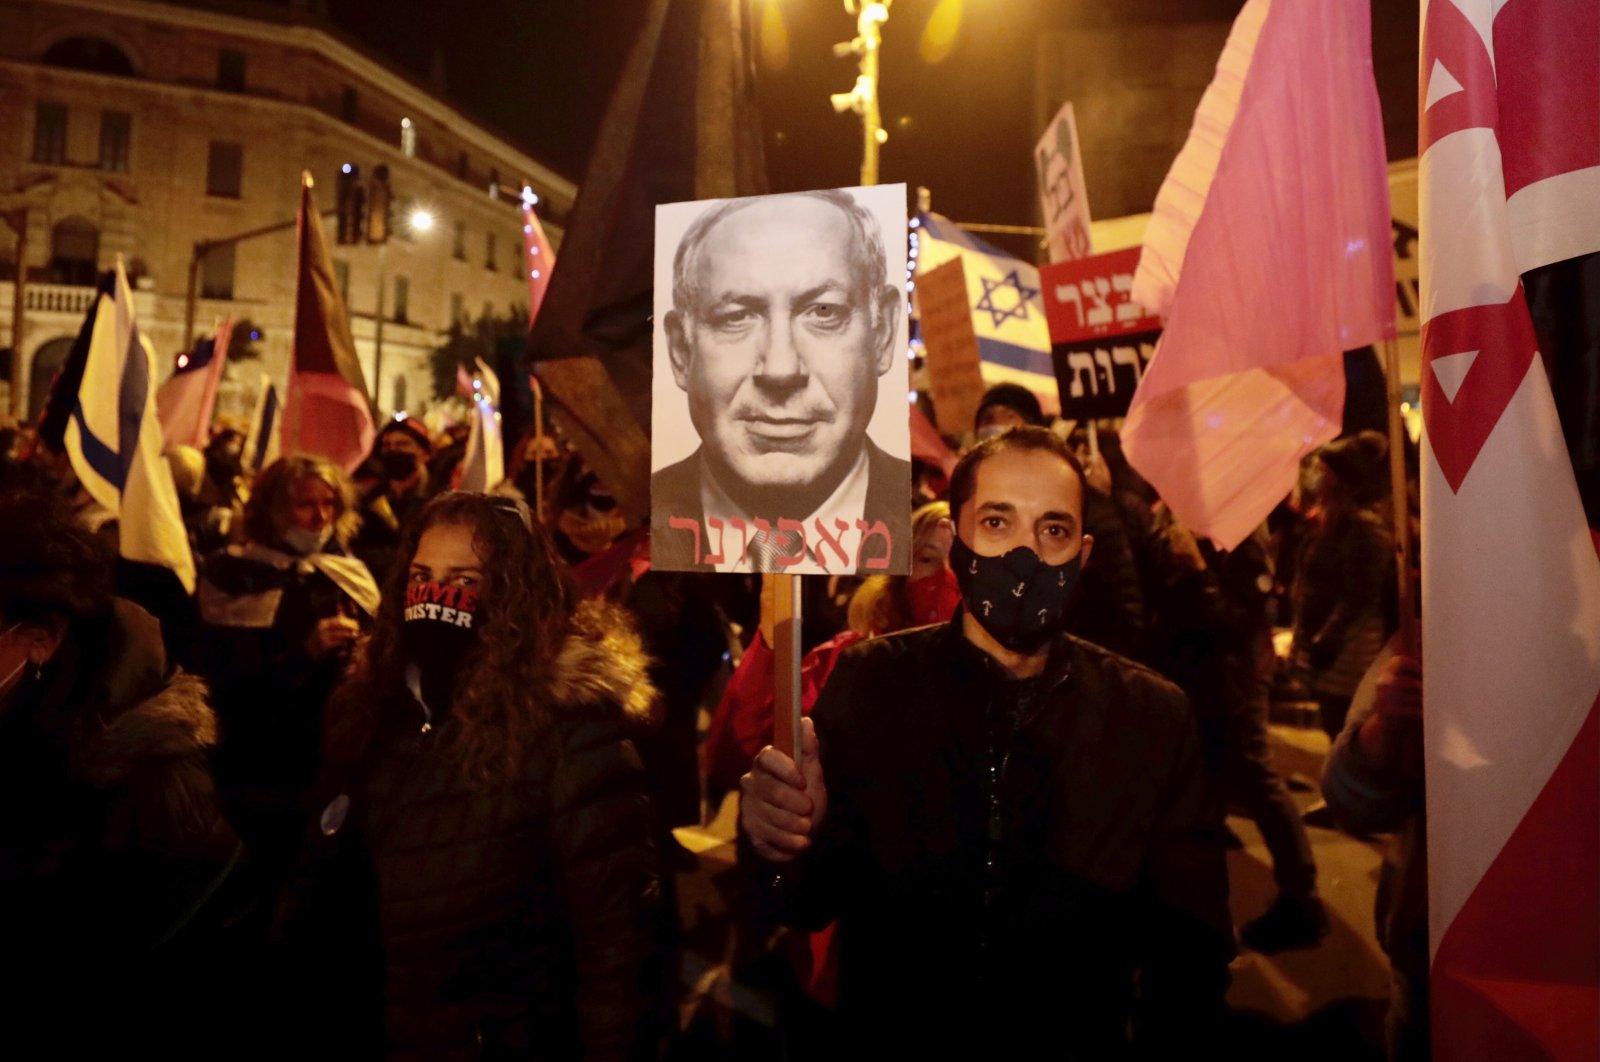 Israeli protesters hold signs during a demonstration against Israeli Prime Minister Benjamin Netanyahu in Jerusalem, Saturday, Dec. 26, 2020. (AP Photo)